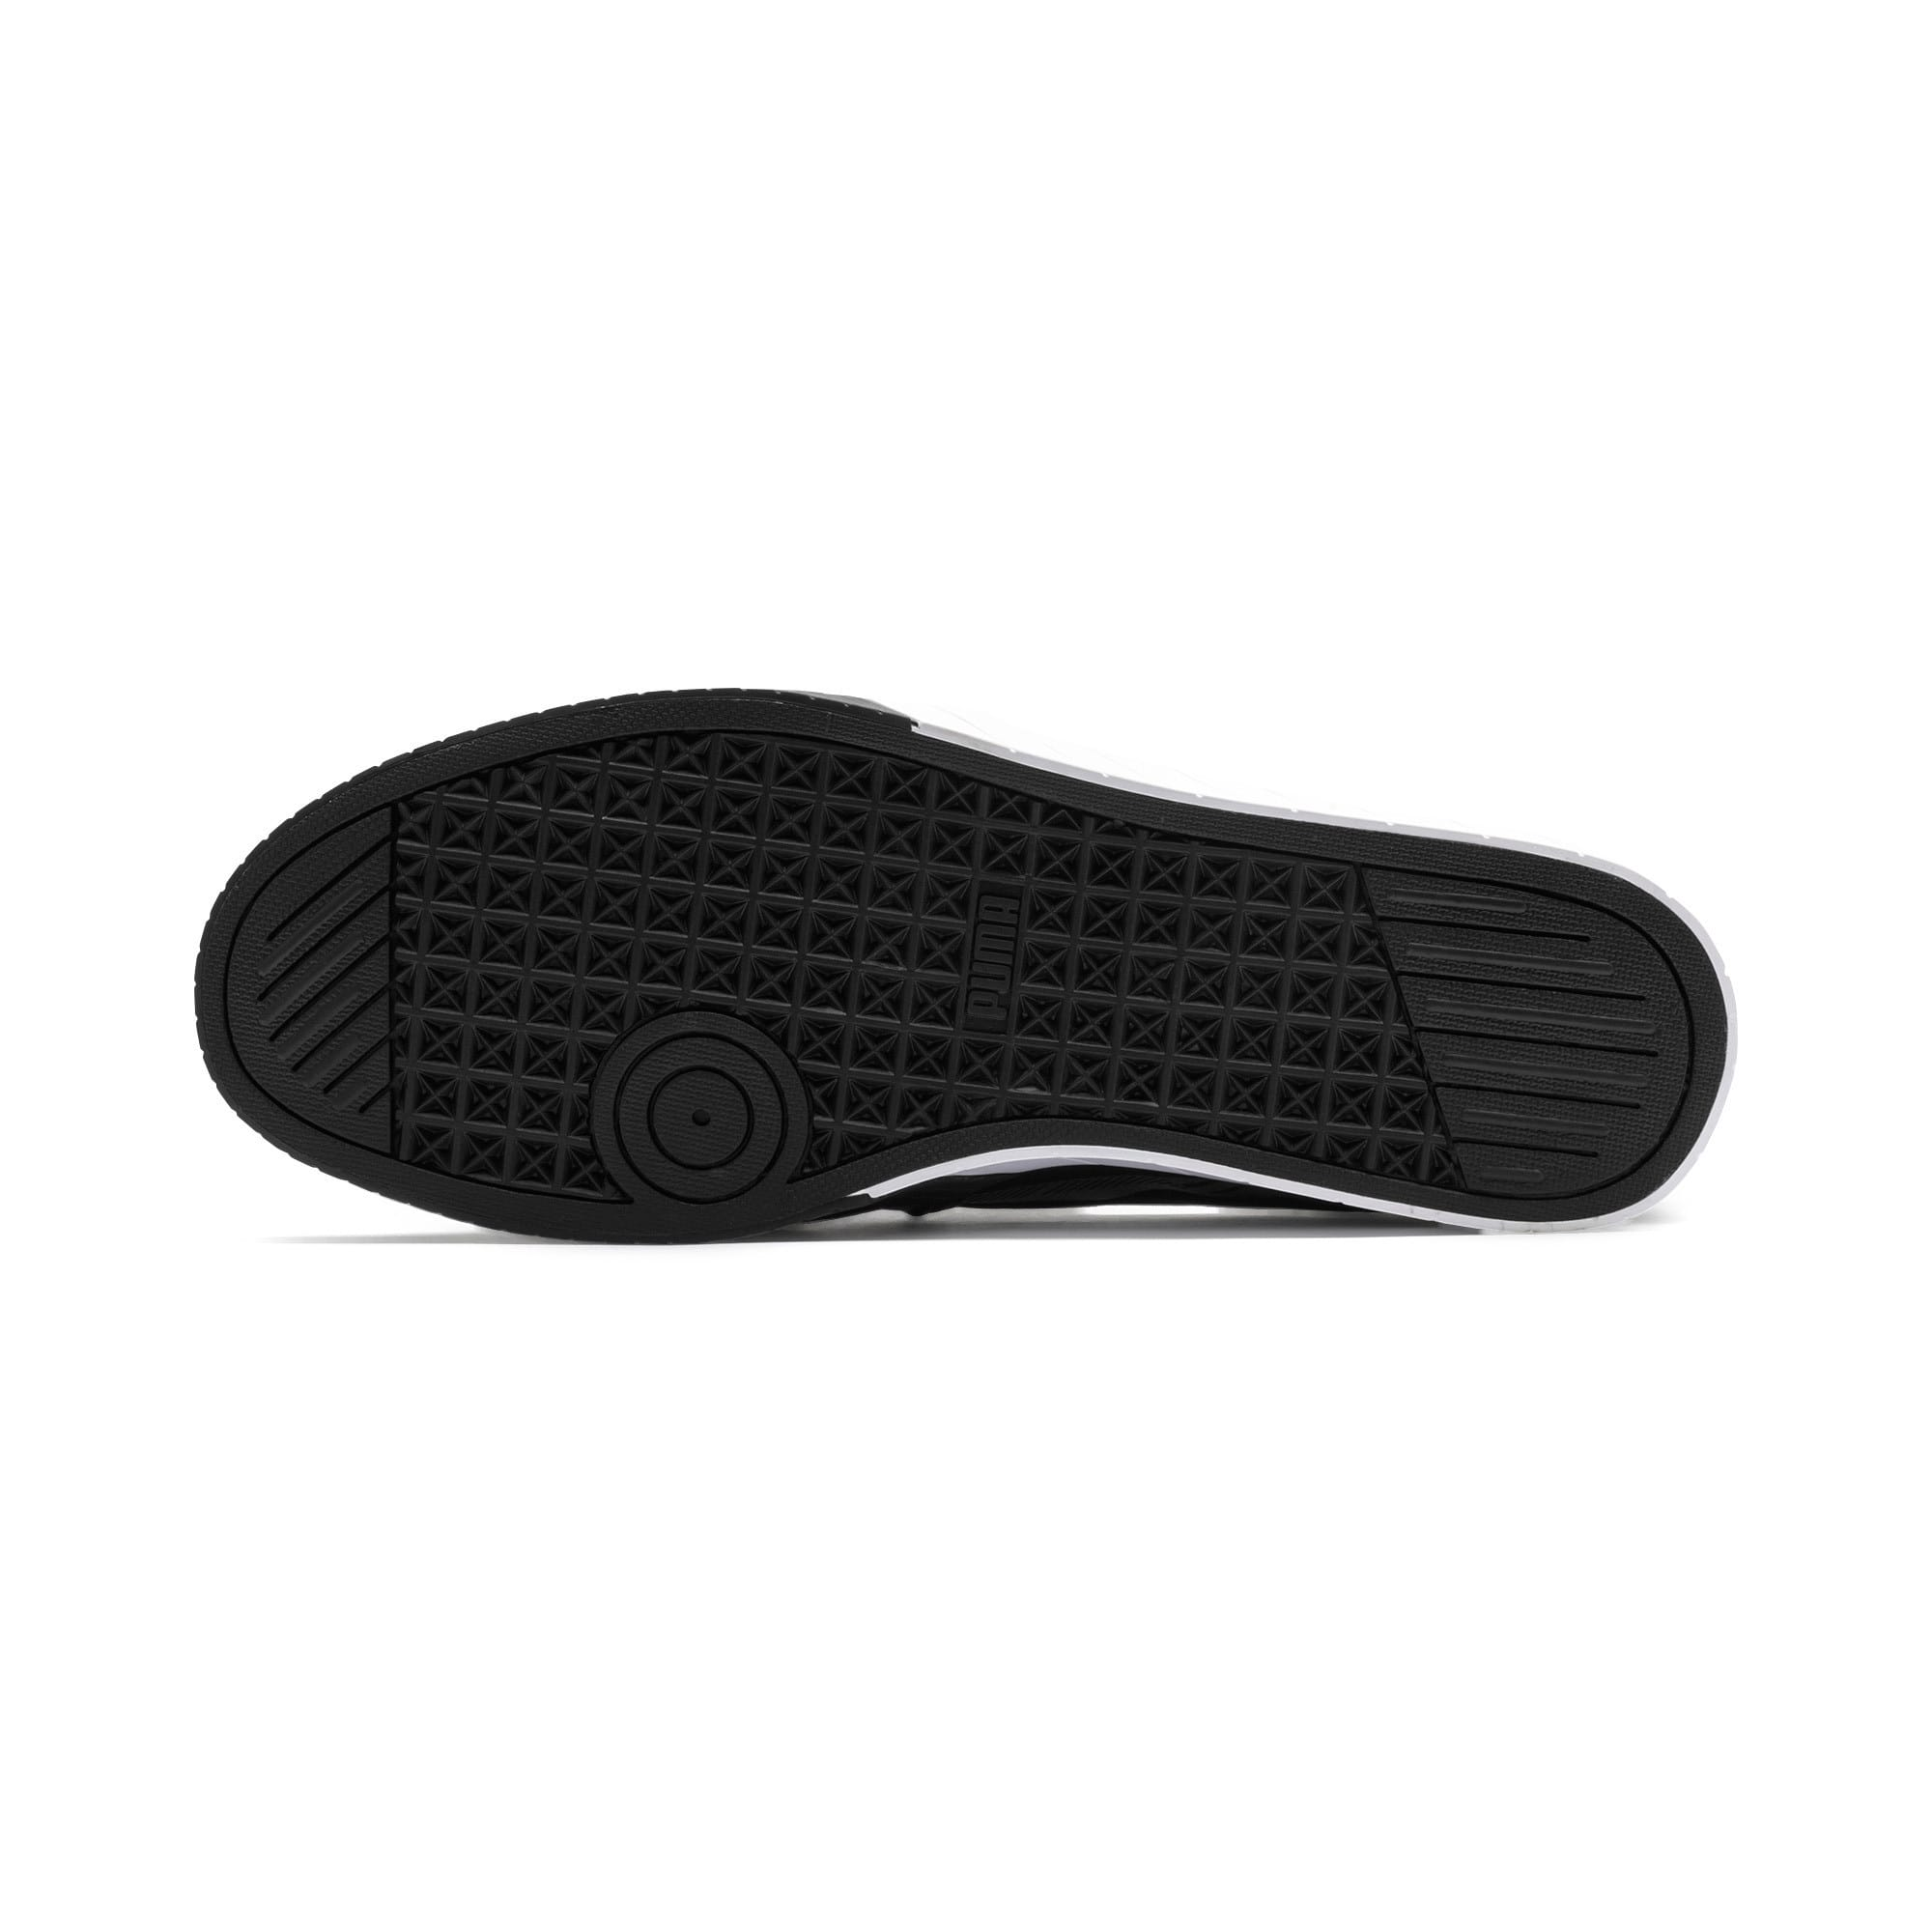 Thumbnail 6 of BMW M Slip-On Track Shoes, Puma Black-Puma Black, medium-IND